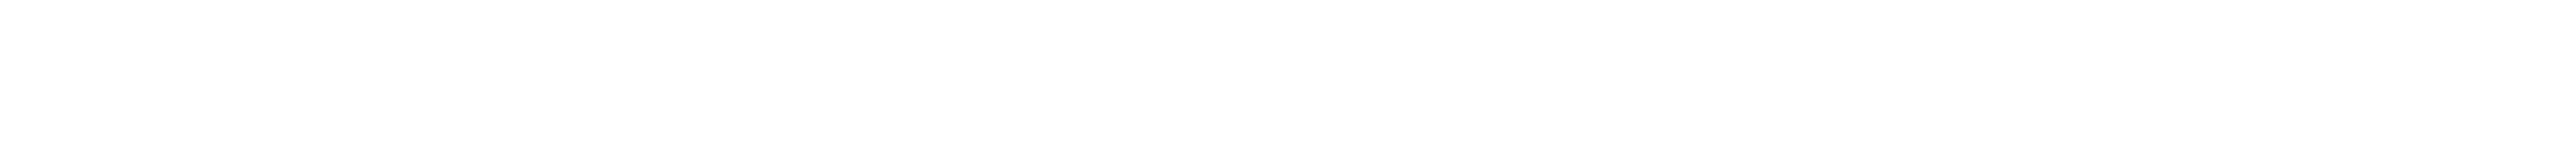 Markup Design